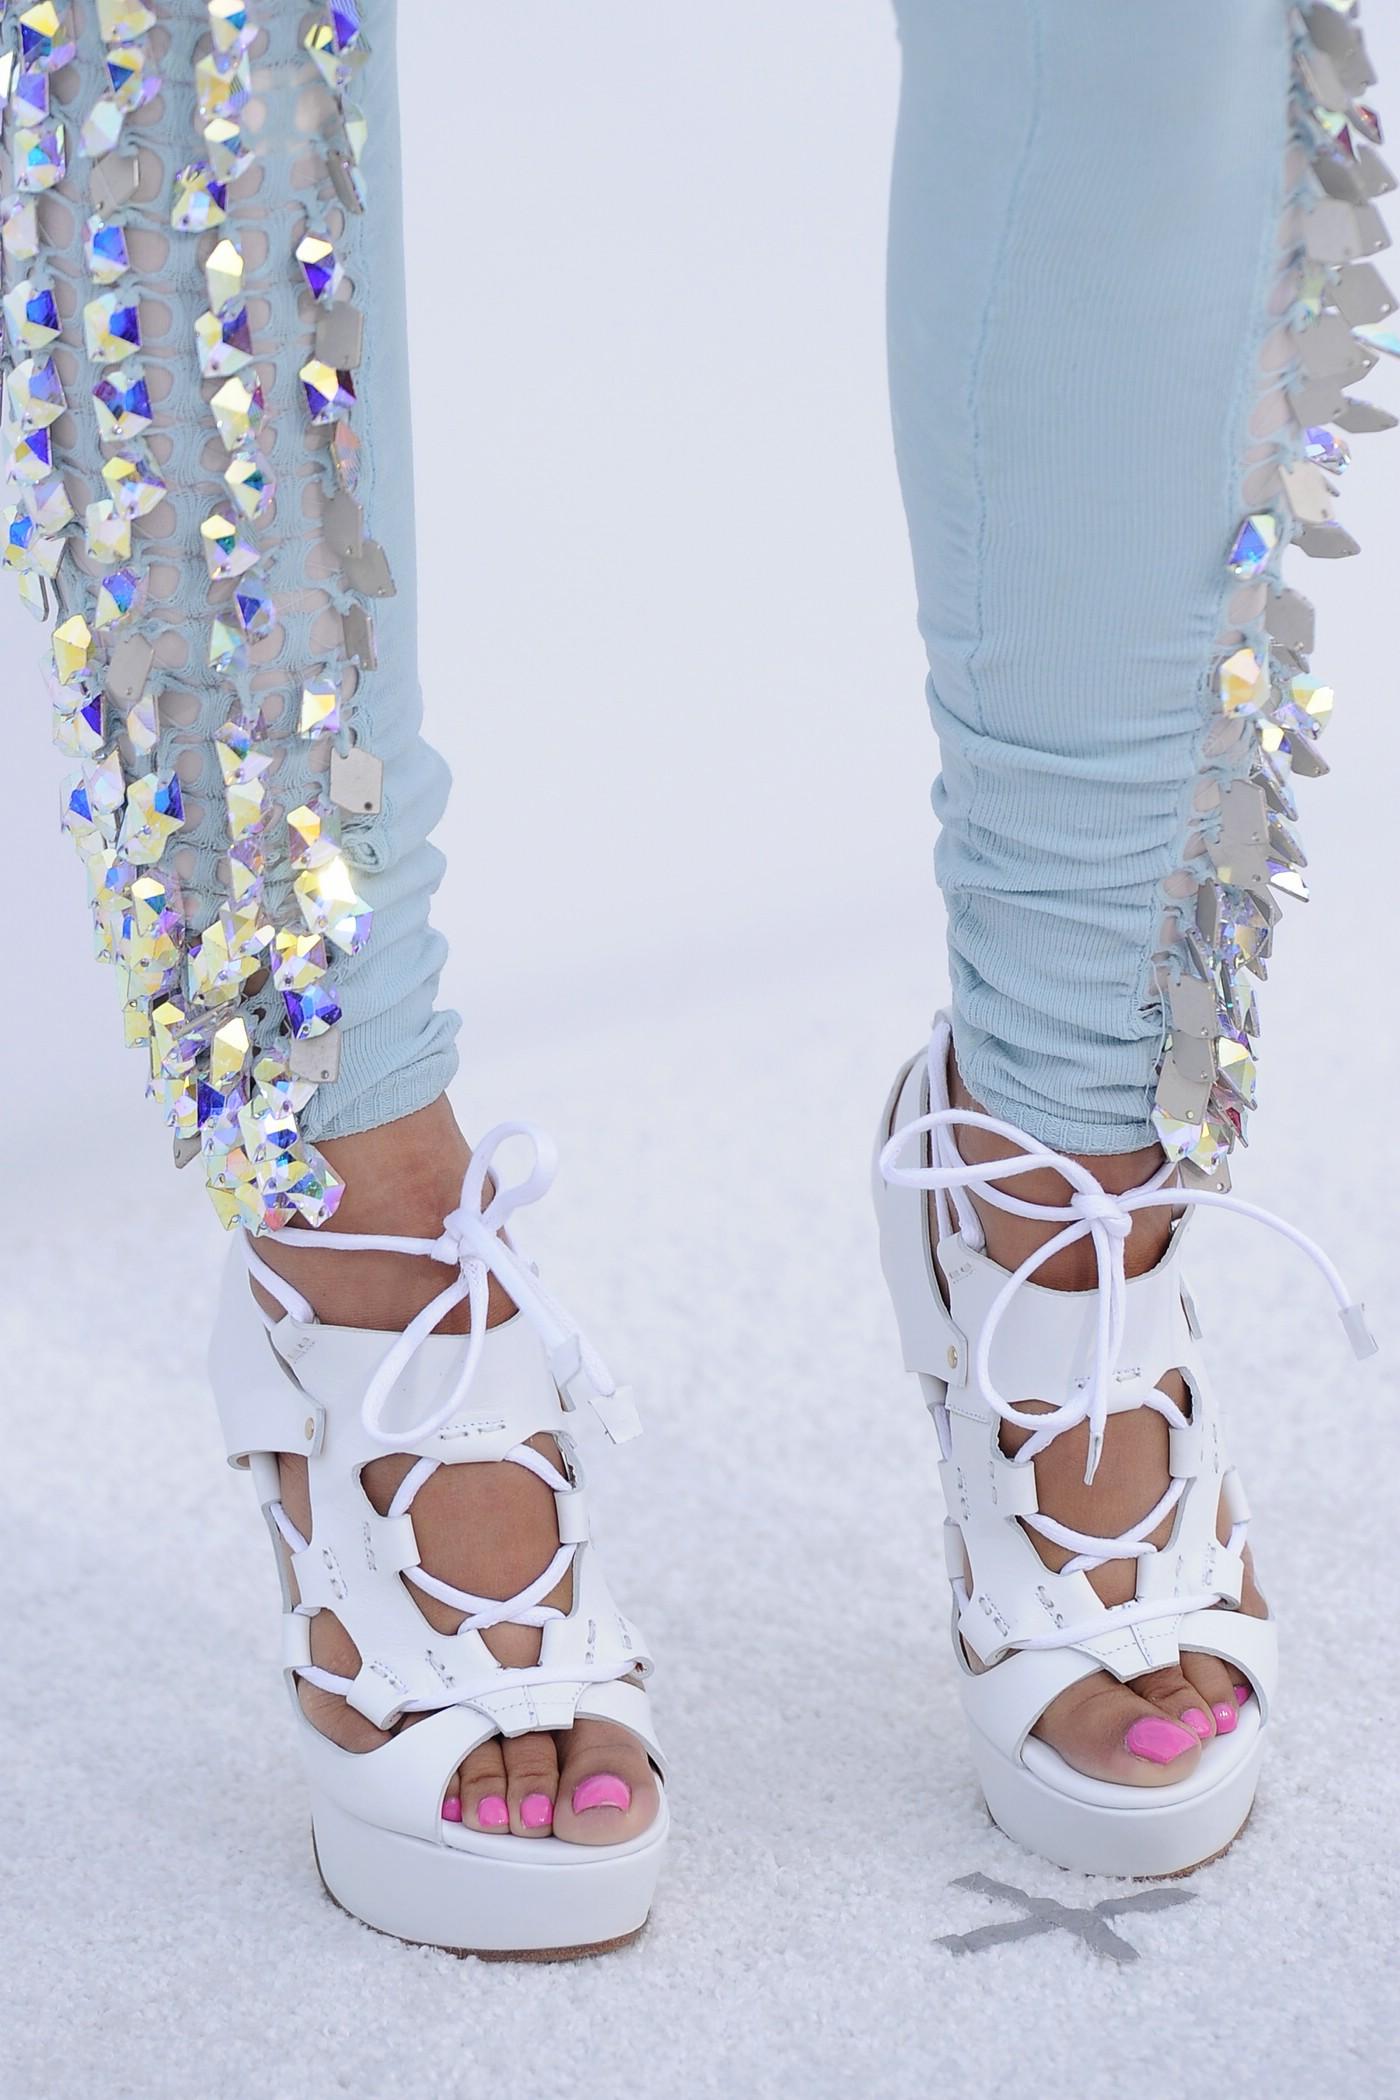 Nicki Minaj Feet Ajilbabcom Portal Picture